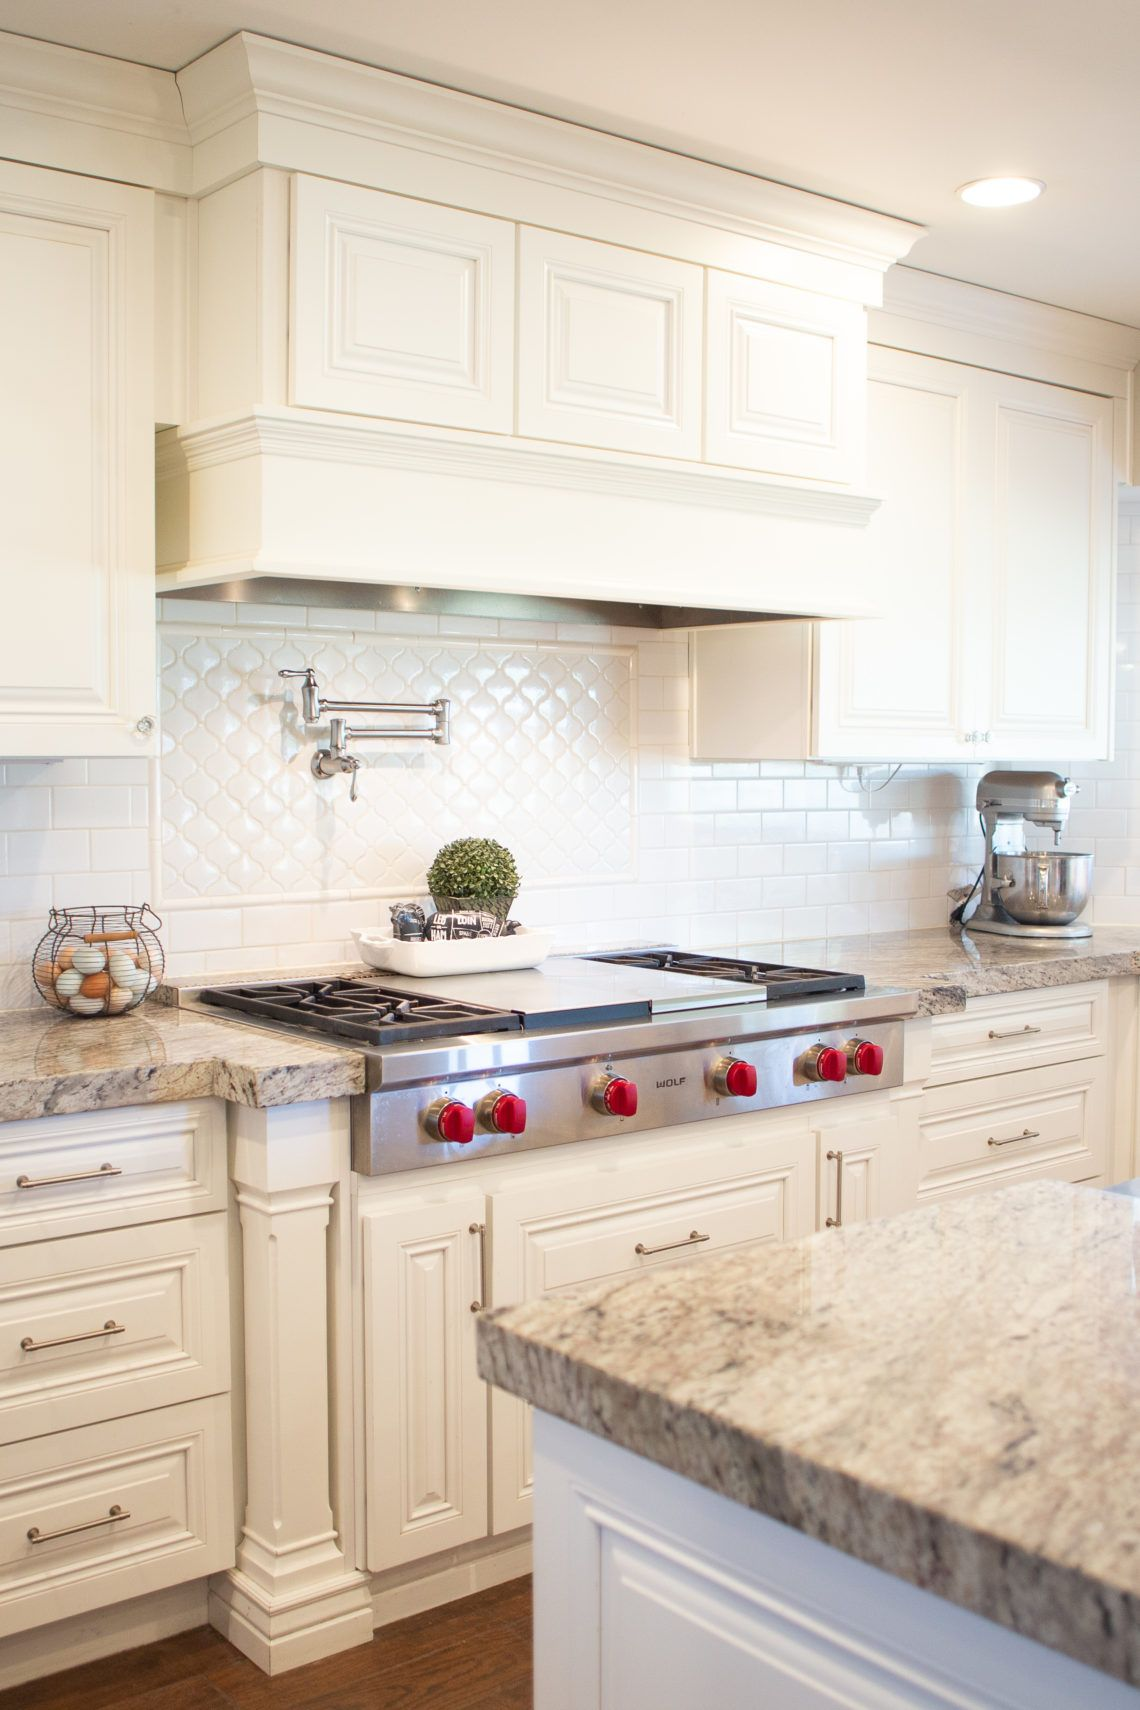 Dream Kitchen White Cabinets Granite Wolf Appliances Check Out